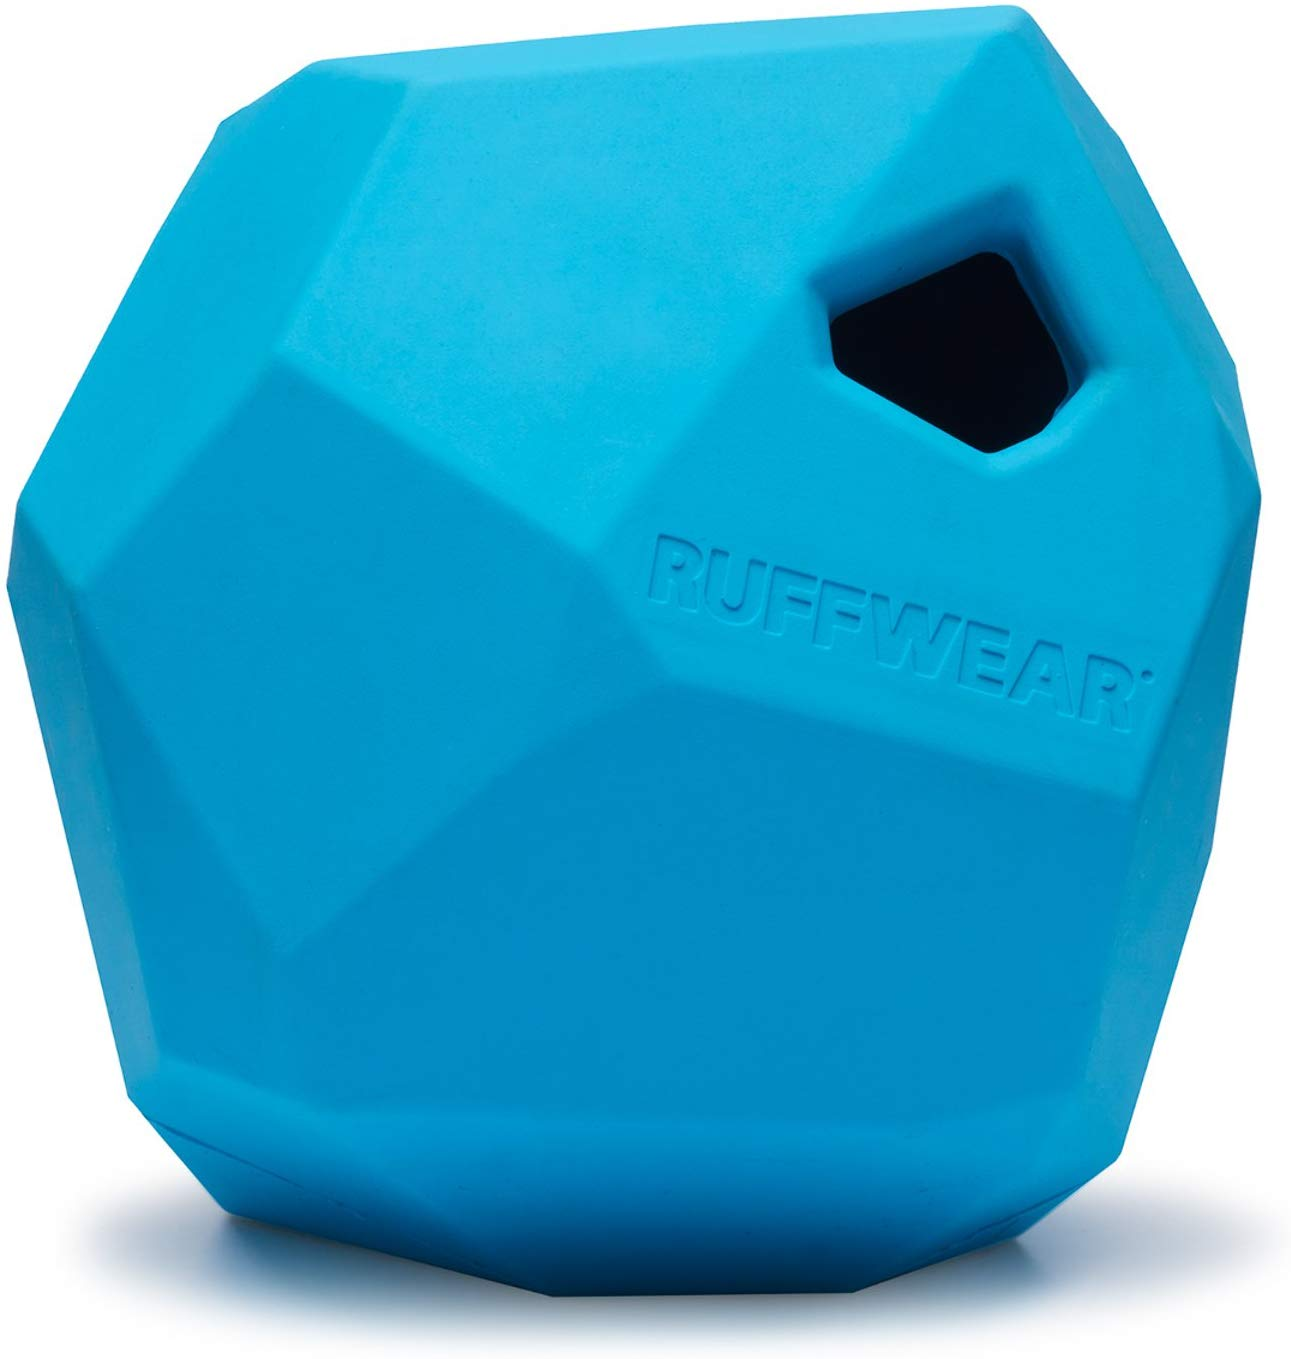 Ruffwear Gnawt-a-Rock Dog Toy, Metolius Blue